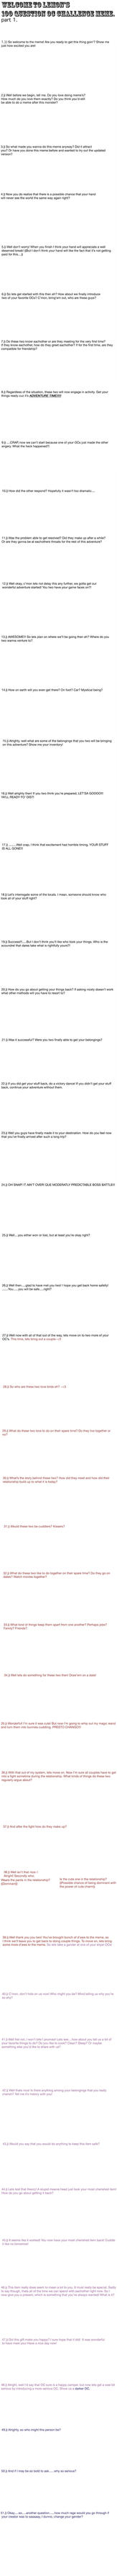 UPDATED 100 Questions part 1 by lemondragon19